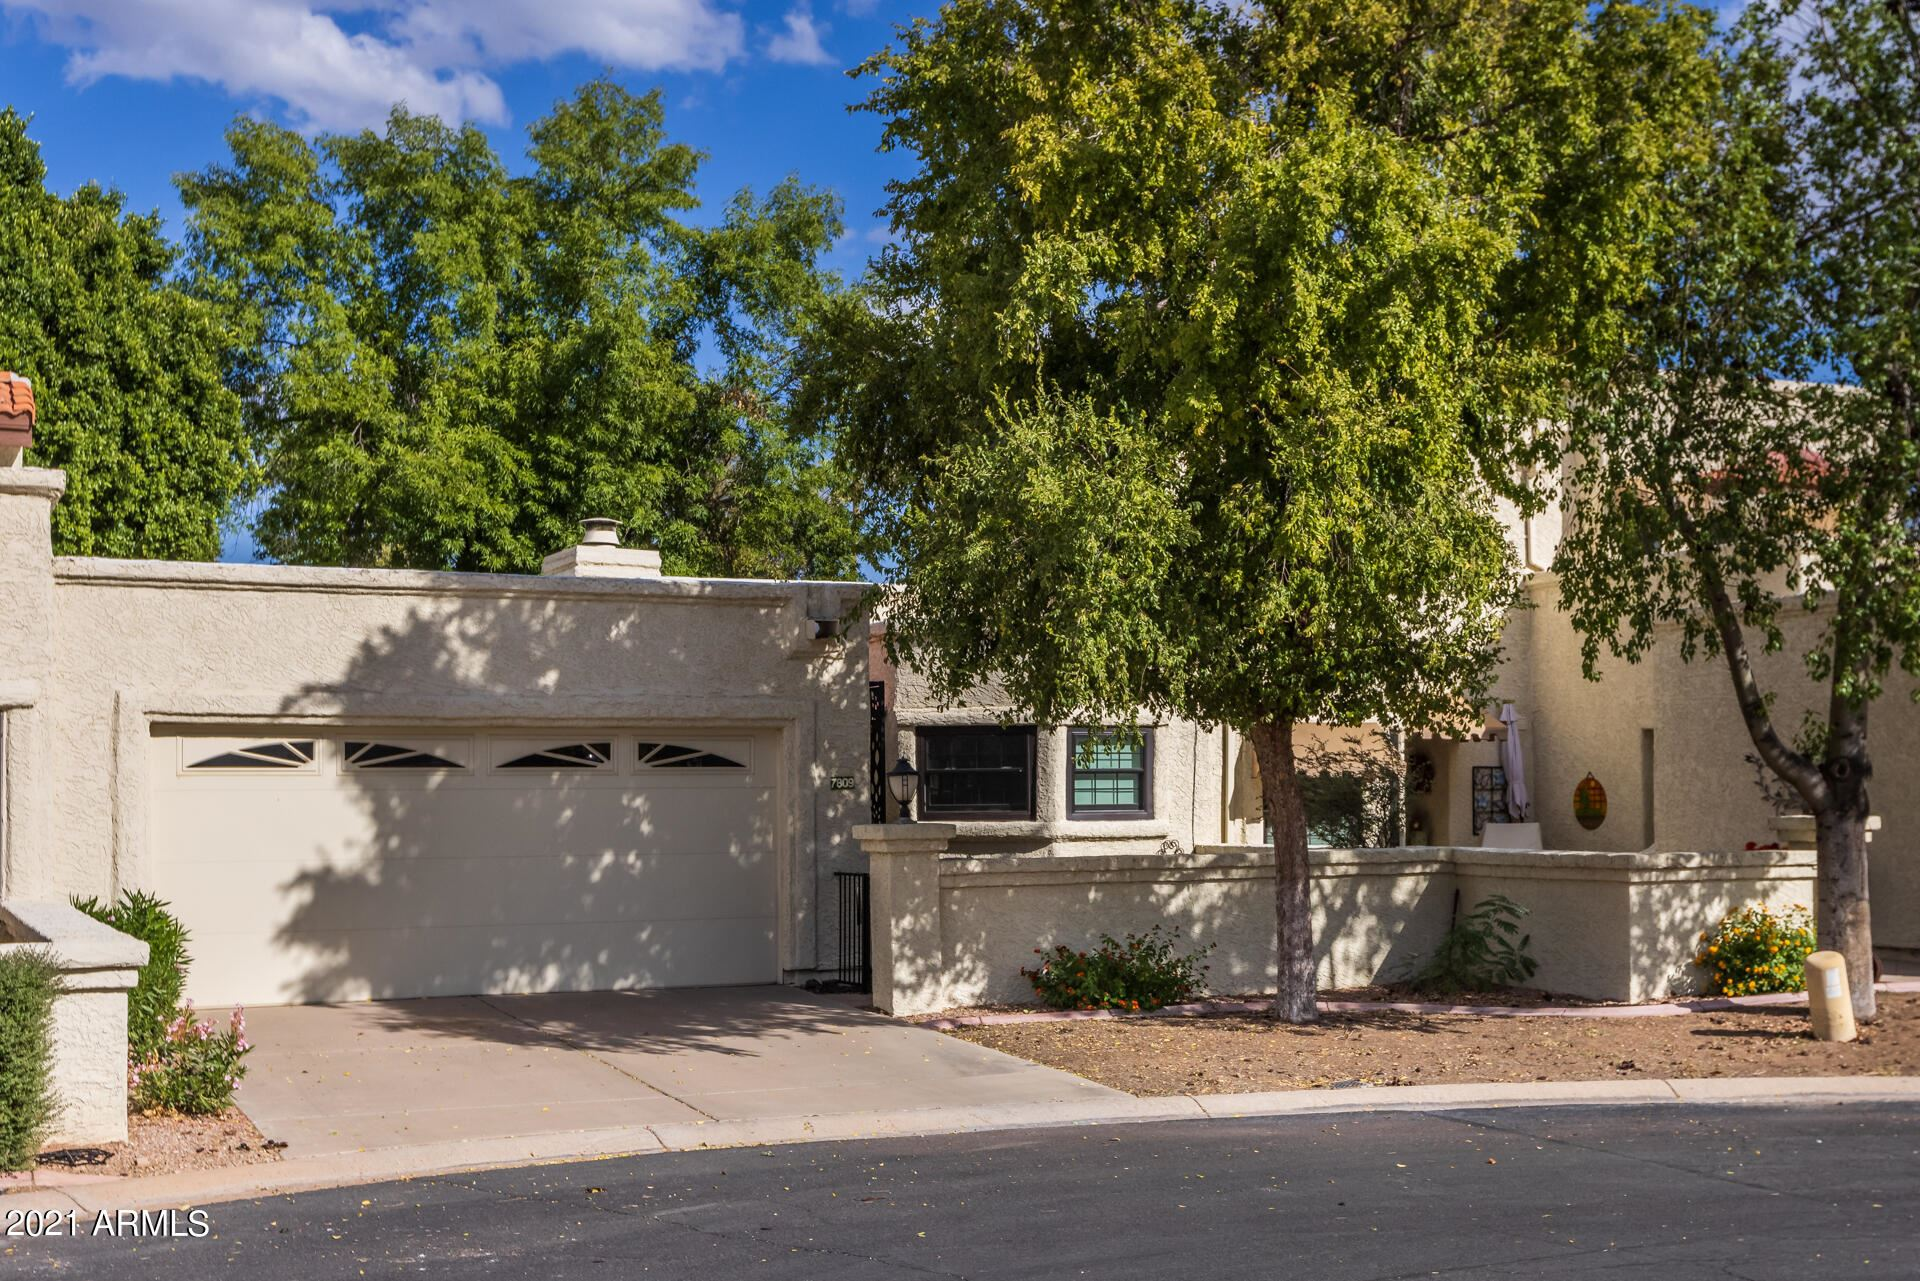 Photo of 7809 S KACHINA Drive, Tempe, AZ 85284 (MLS # 6310278)